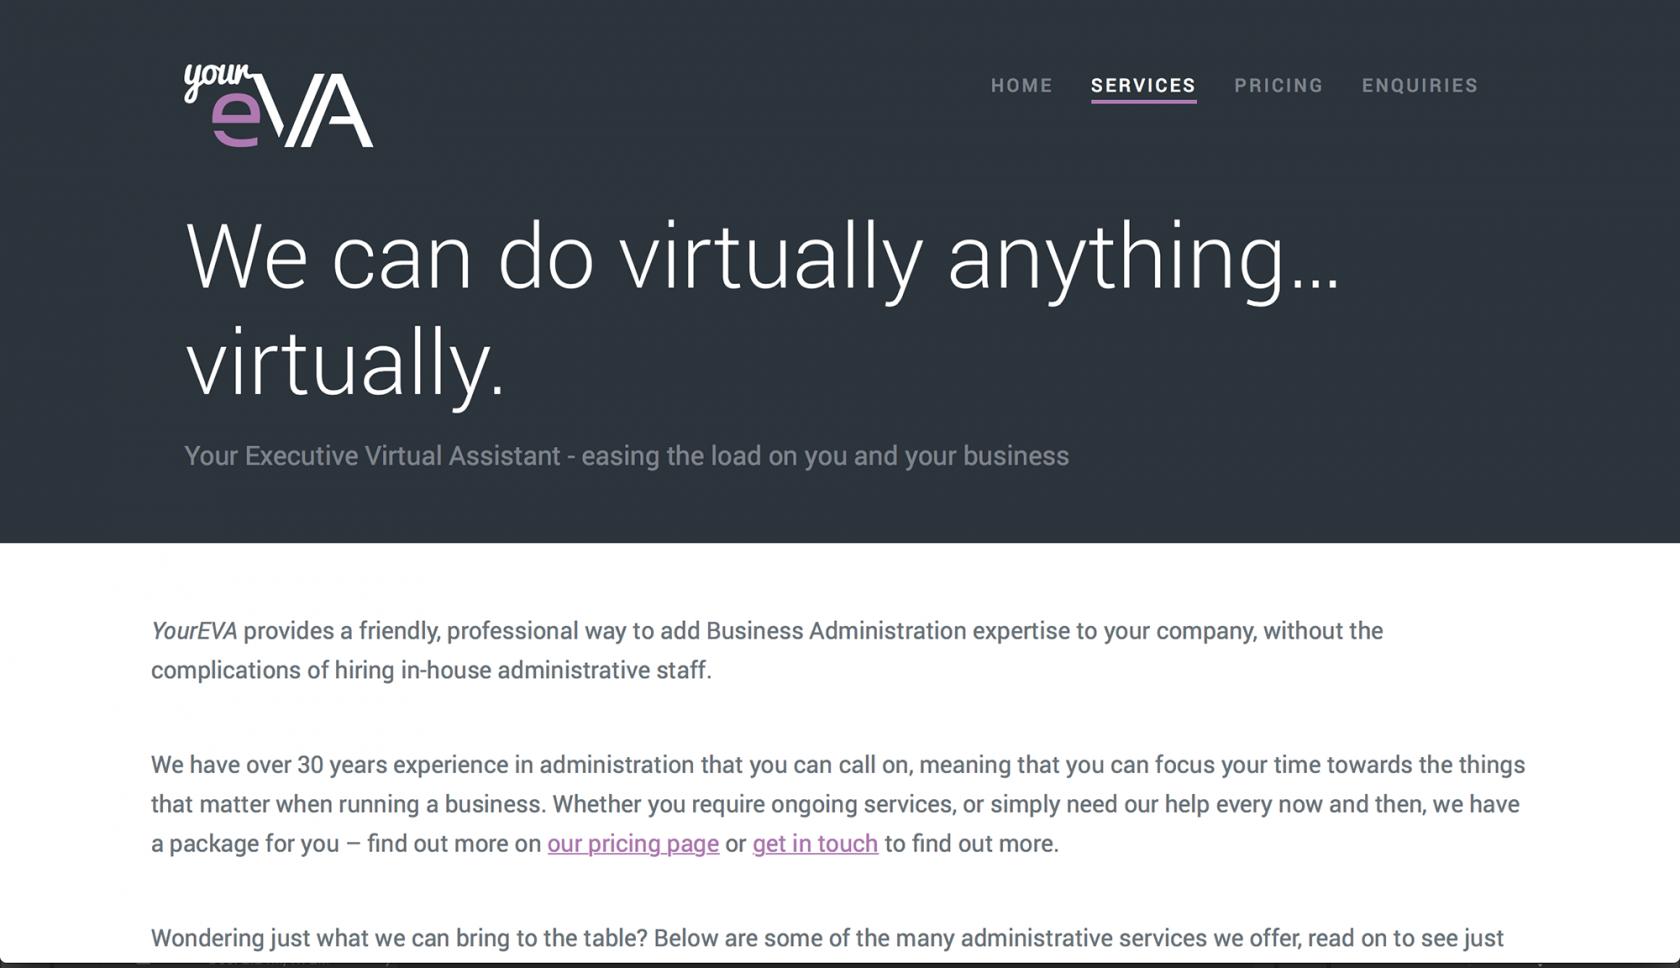 YourEVA services page - Wordpress theme